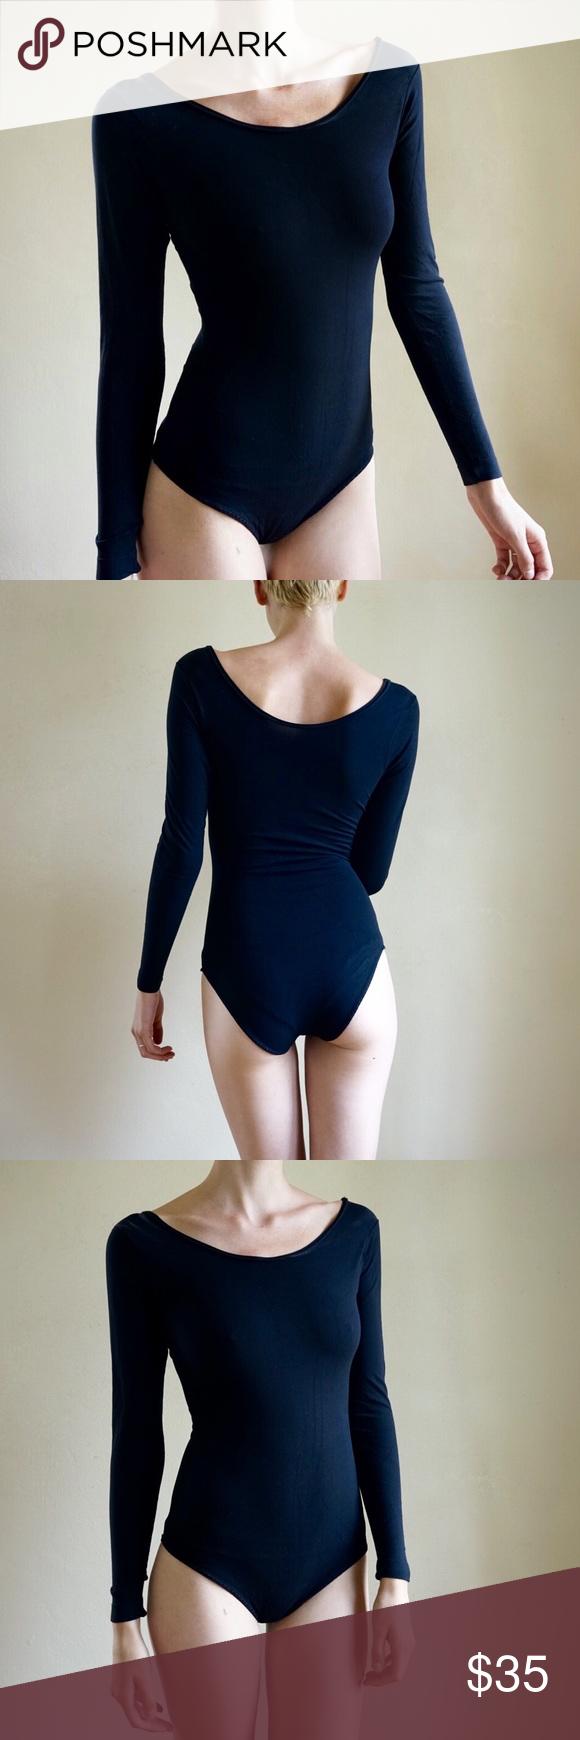 49f2835f79c Vintage black bodysuit Vintage long sleeve bodysuit from Sears. Made of  100% nylon